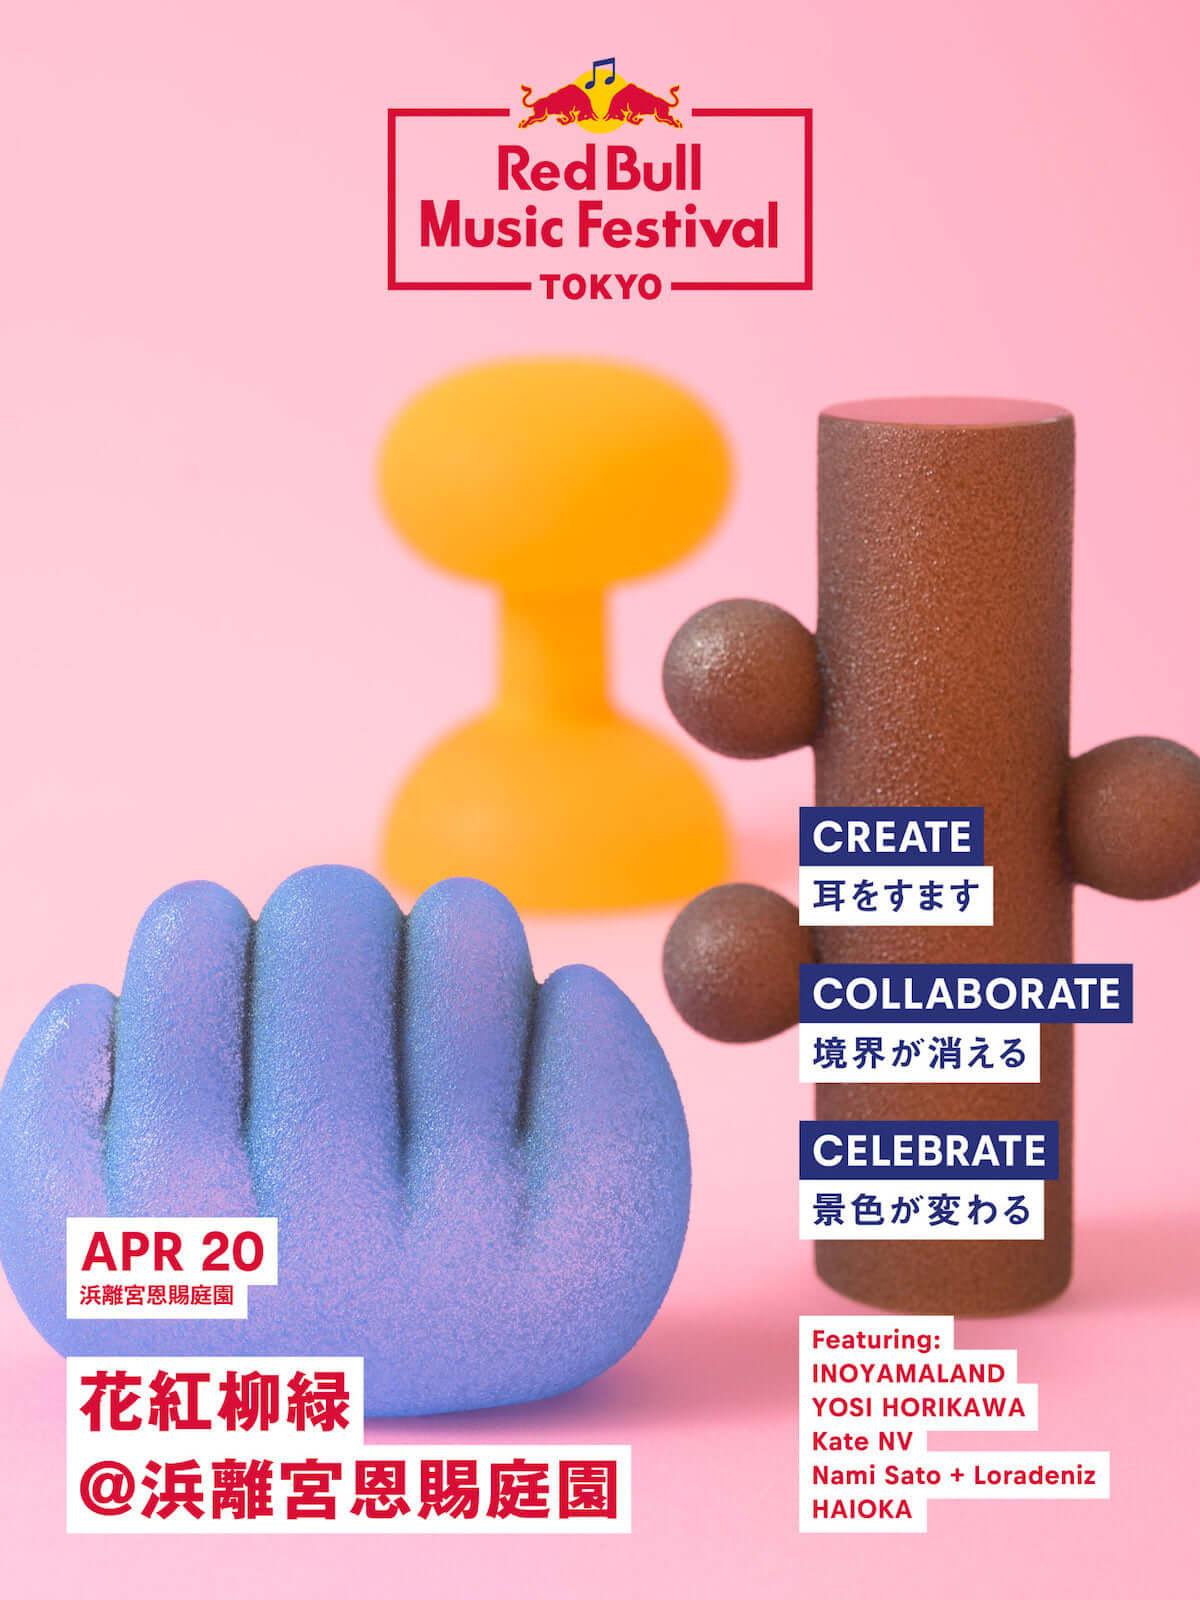 『Red Bull Music Festival Tokyo 2019』最終日に「浜離宮恩賜庭園」で開催されるアンビエント音楽のイベント詳細が明らかに music190318-redbull-kako-ryuryoku-7-1200x1600